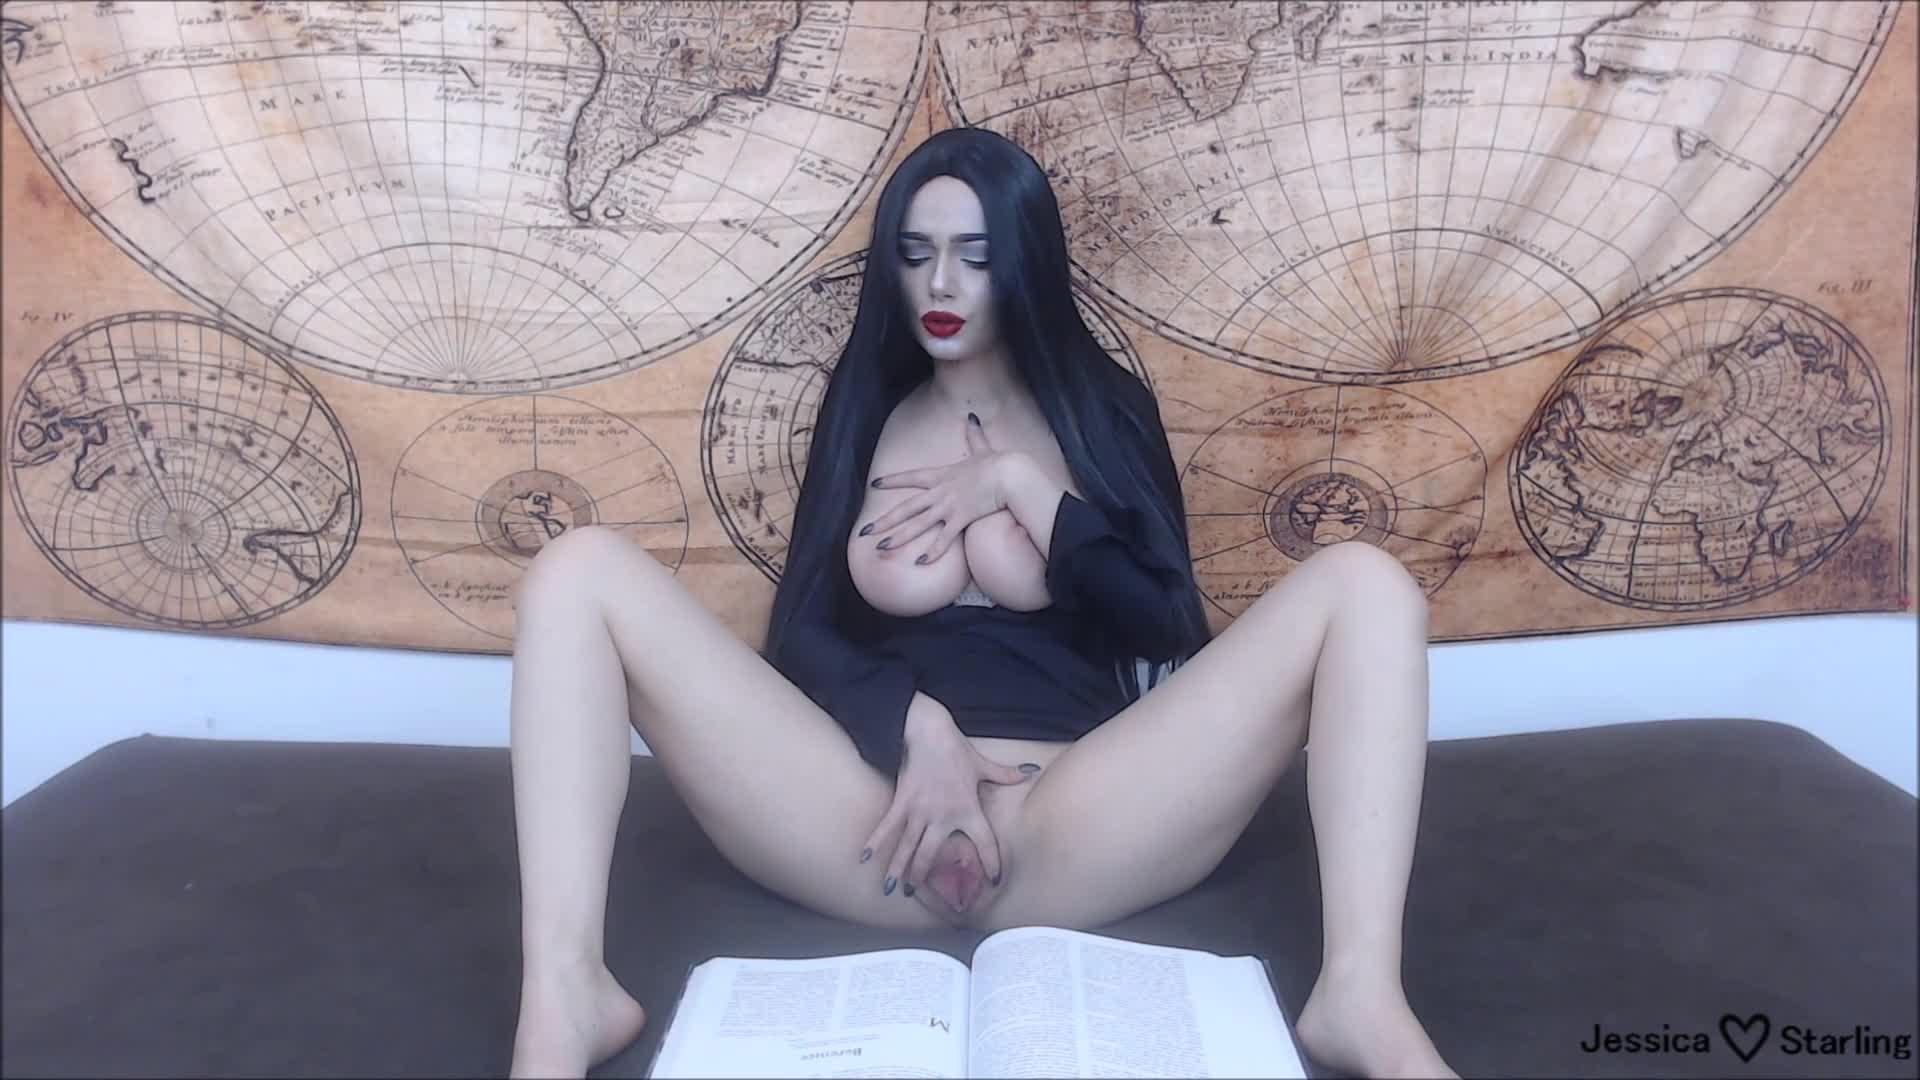 """Jessica Starling"" (Cosplay, Halloween, Masturbation, Fingering, Dildo Fucking) Morticia Fingers and Fucks to Poe - ManyVids Production"